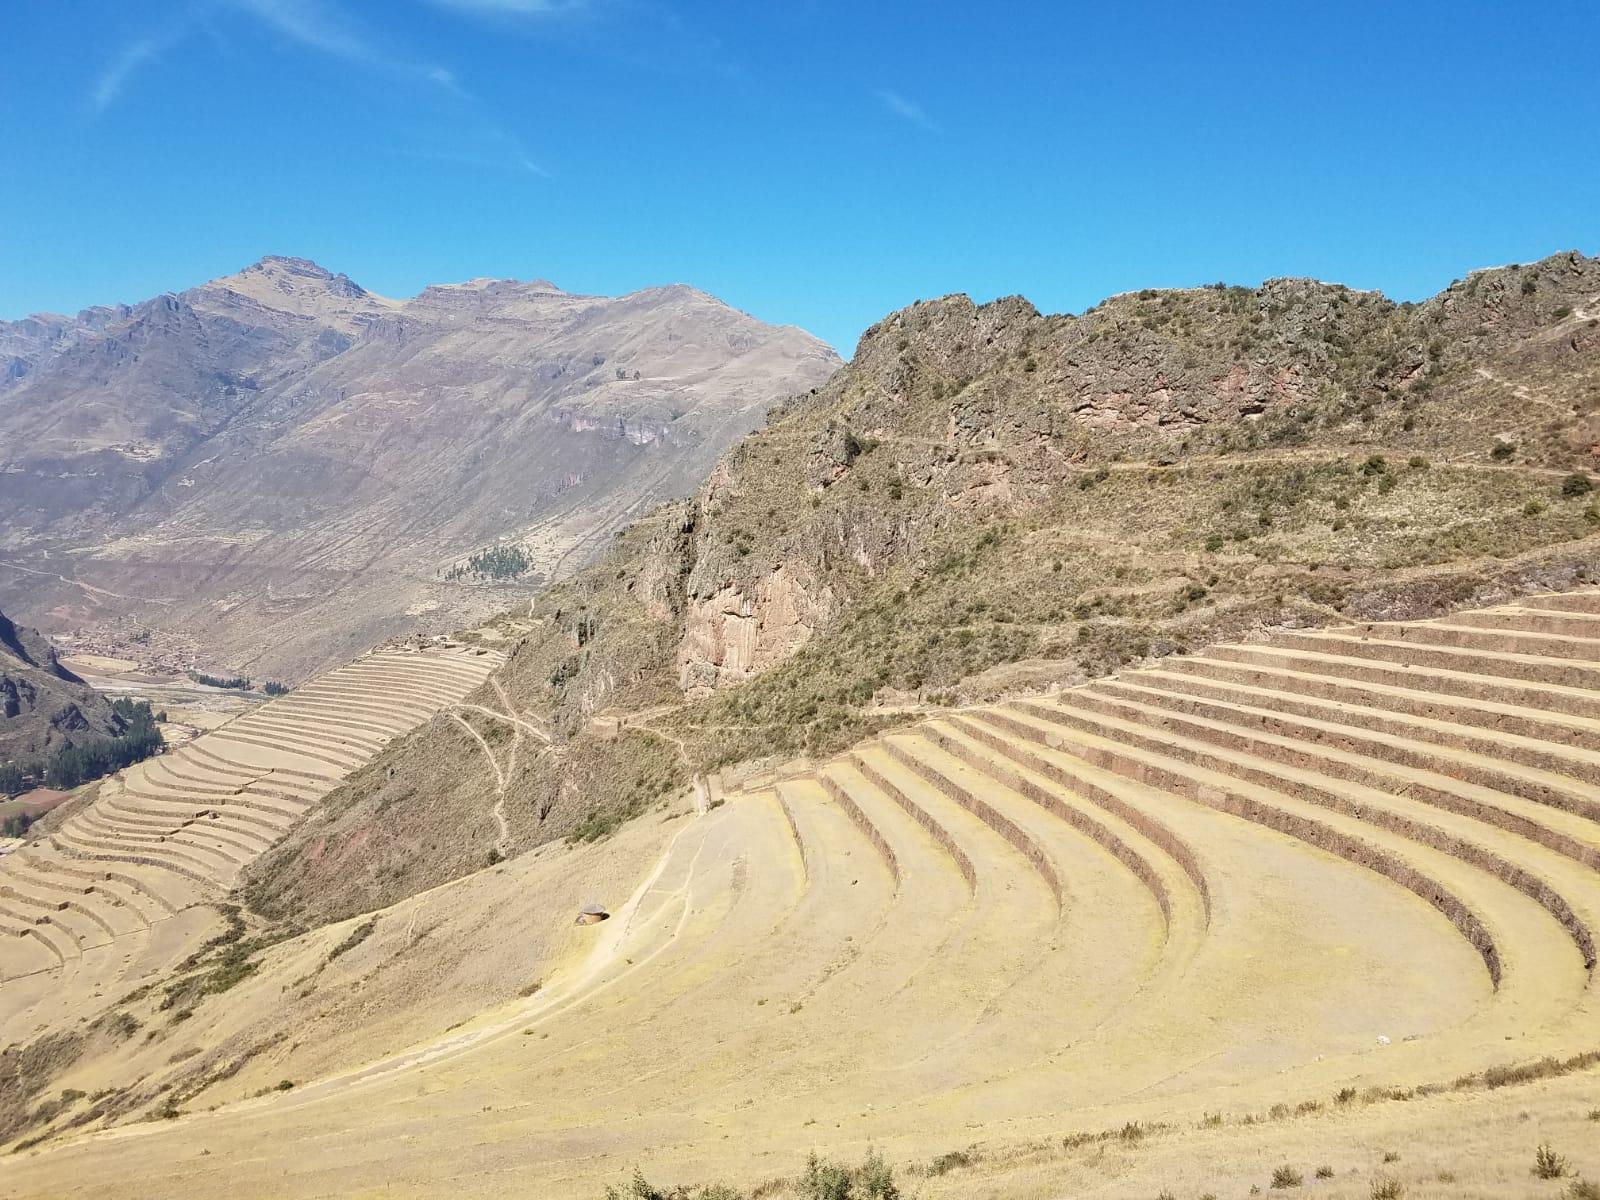 Inca terraces used for farming